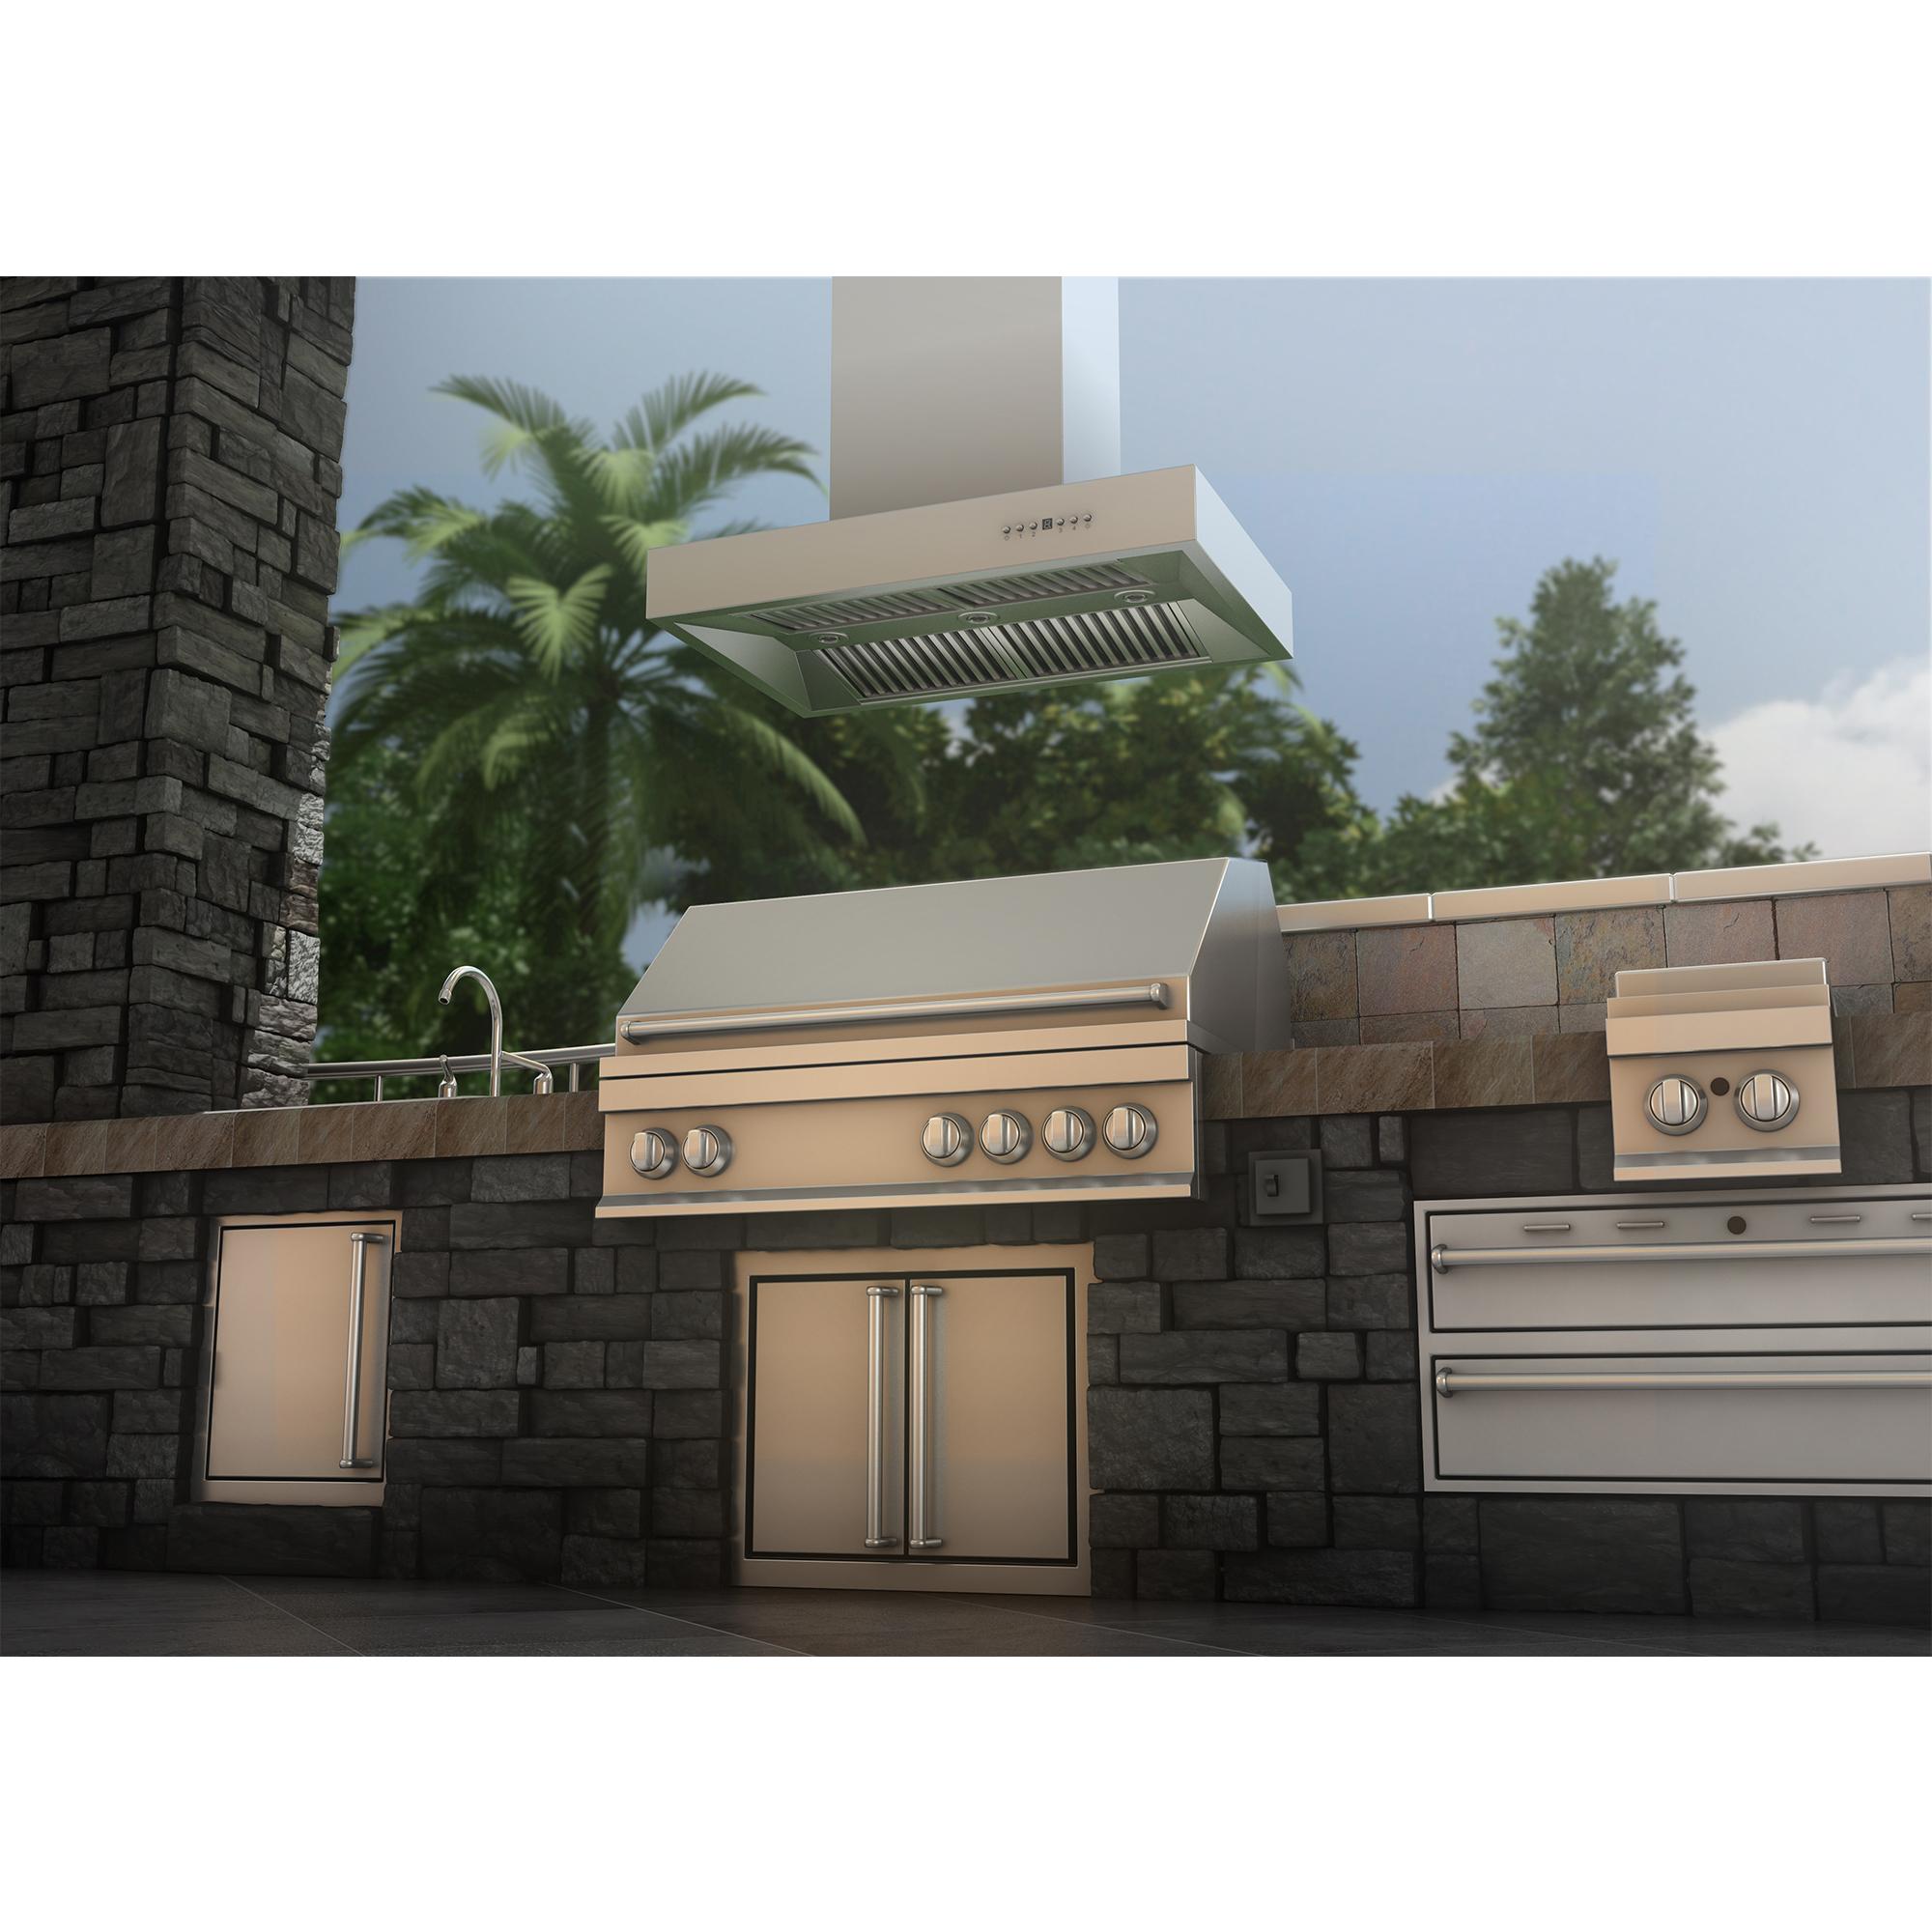 zline-stainless-steel-island-range-hood-KECOMi-kitchen-outdoor-3.jpg